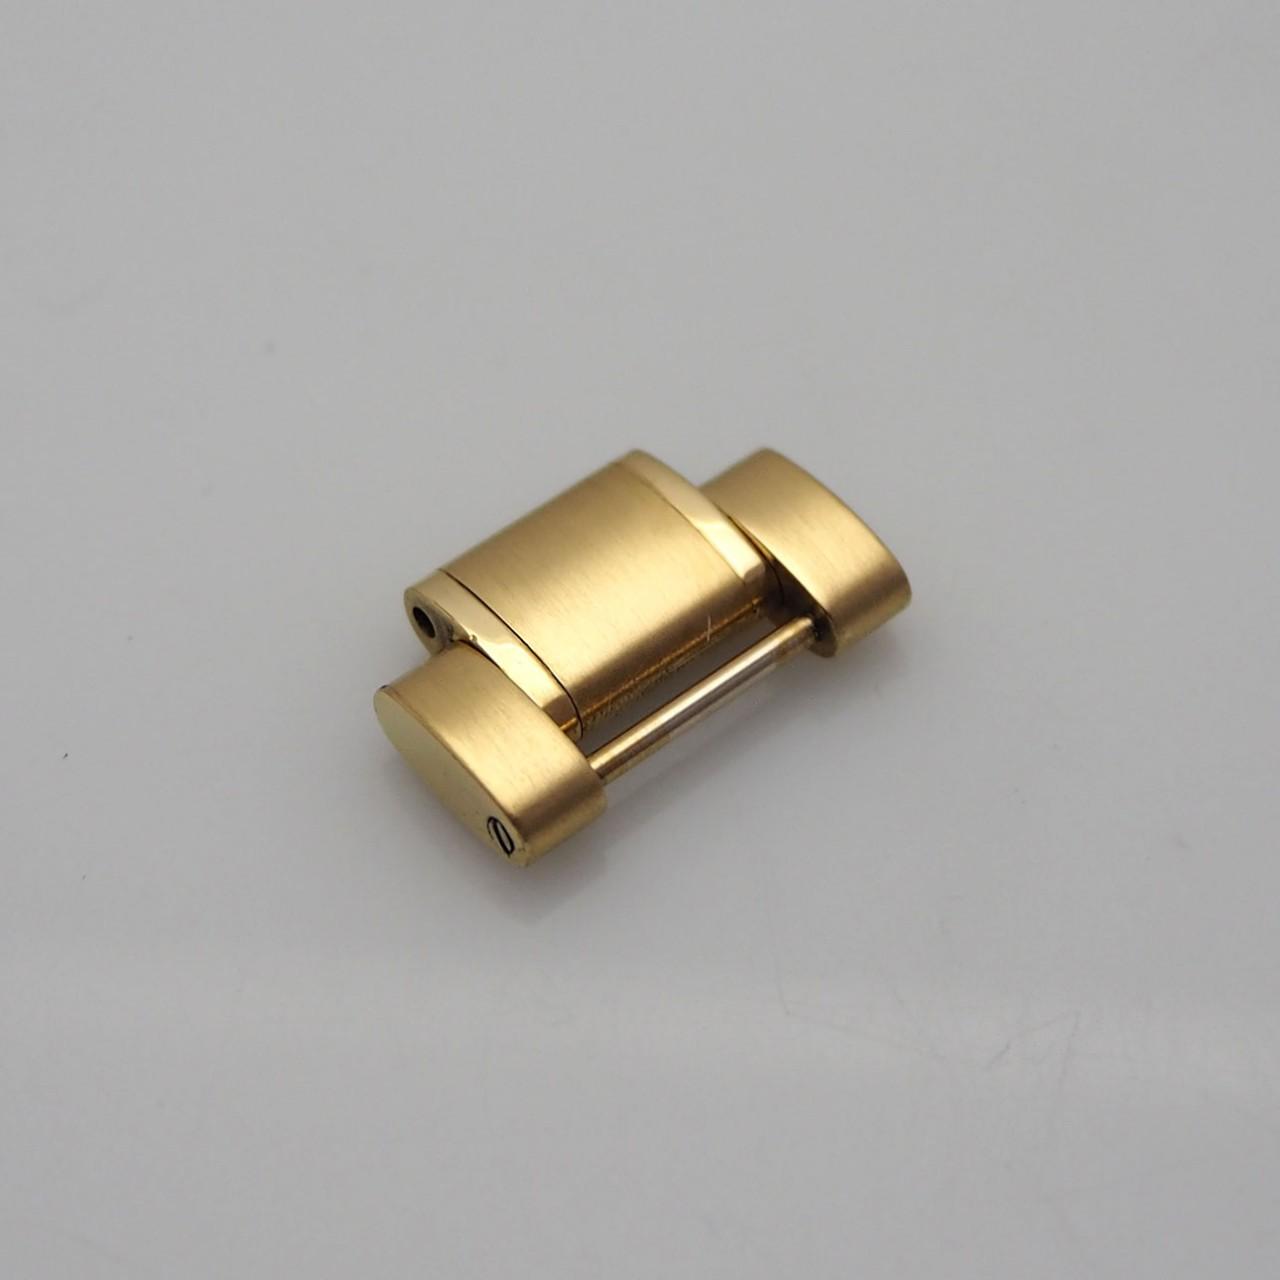 Omega Speedmaster Gold 18k/ 750 -Glied/ Bandelement/ Bandglied 16mm